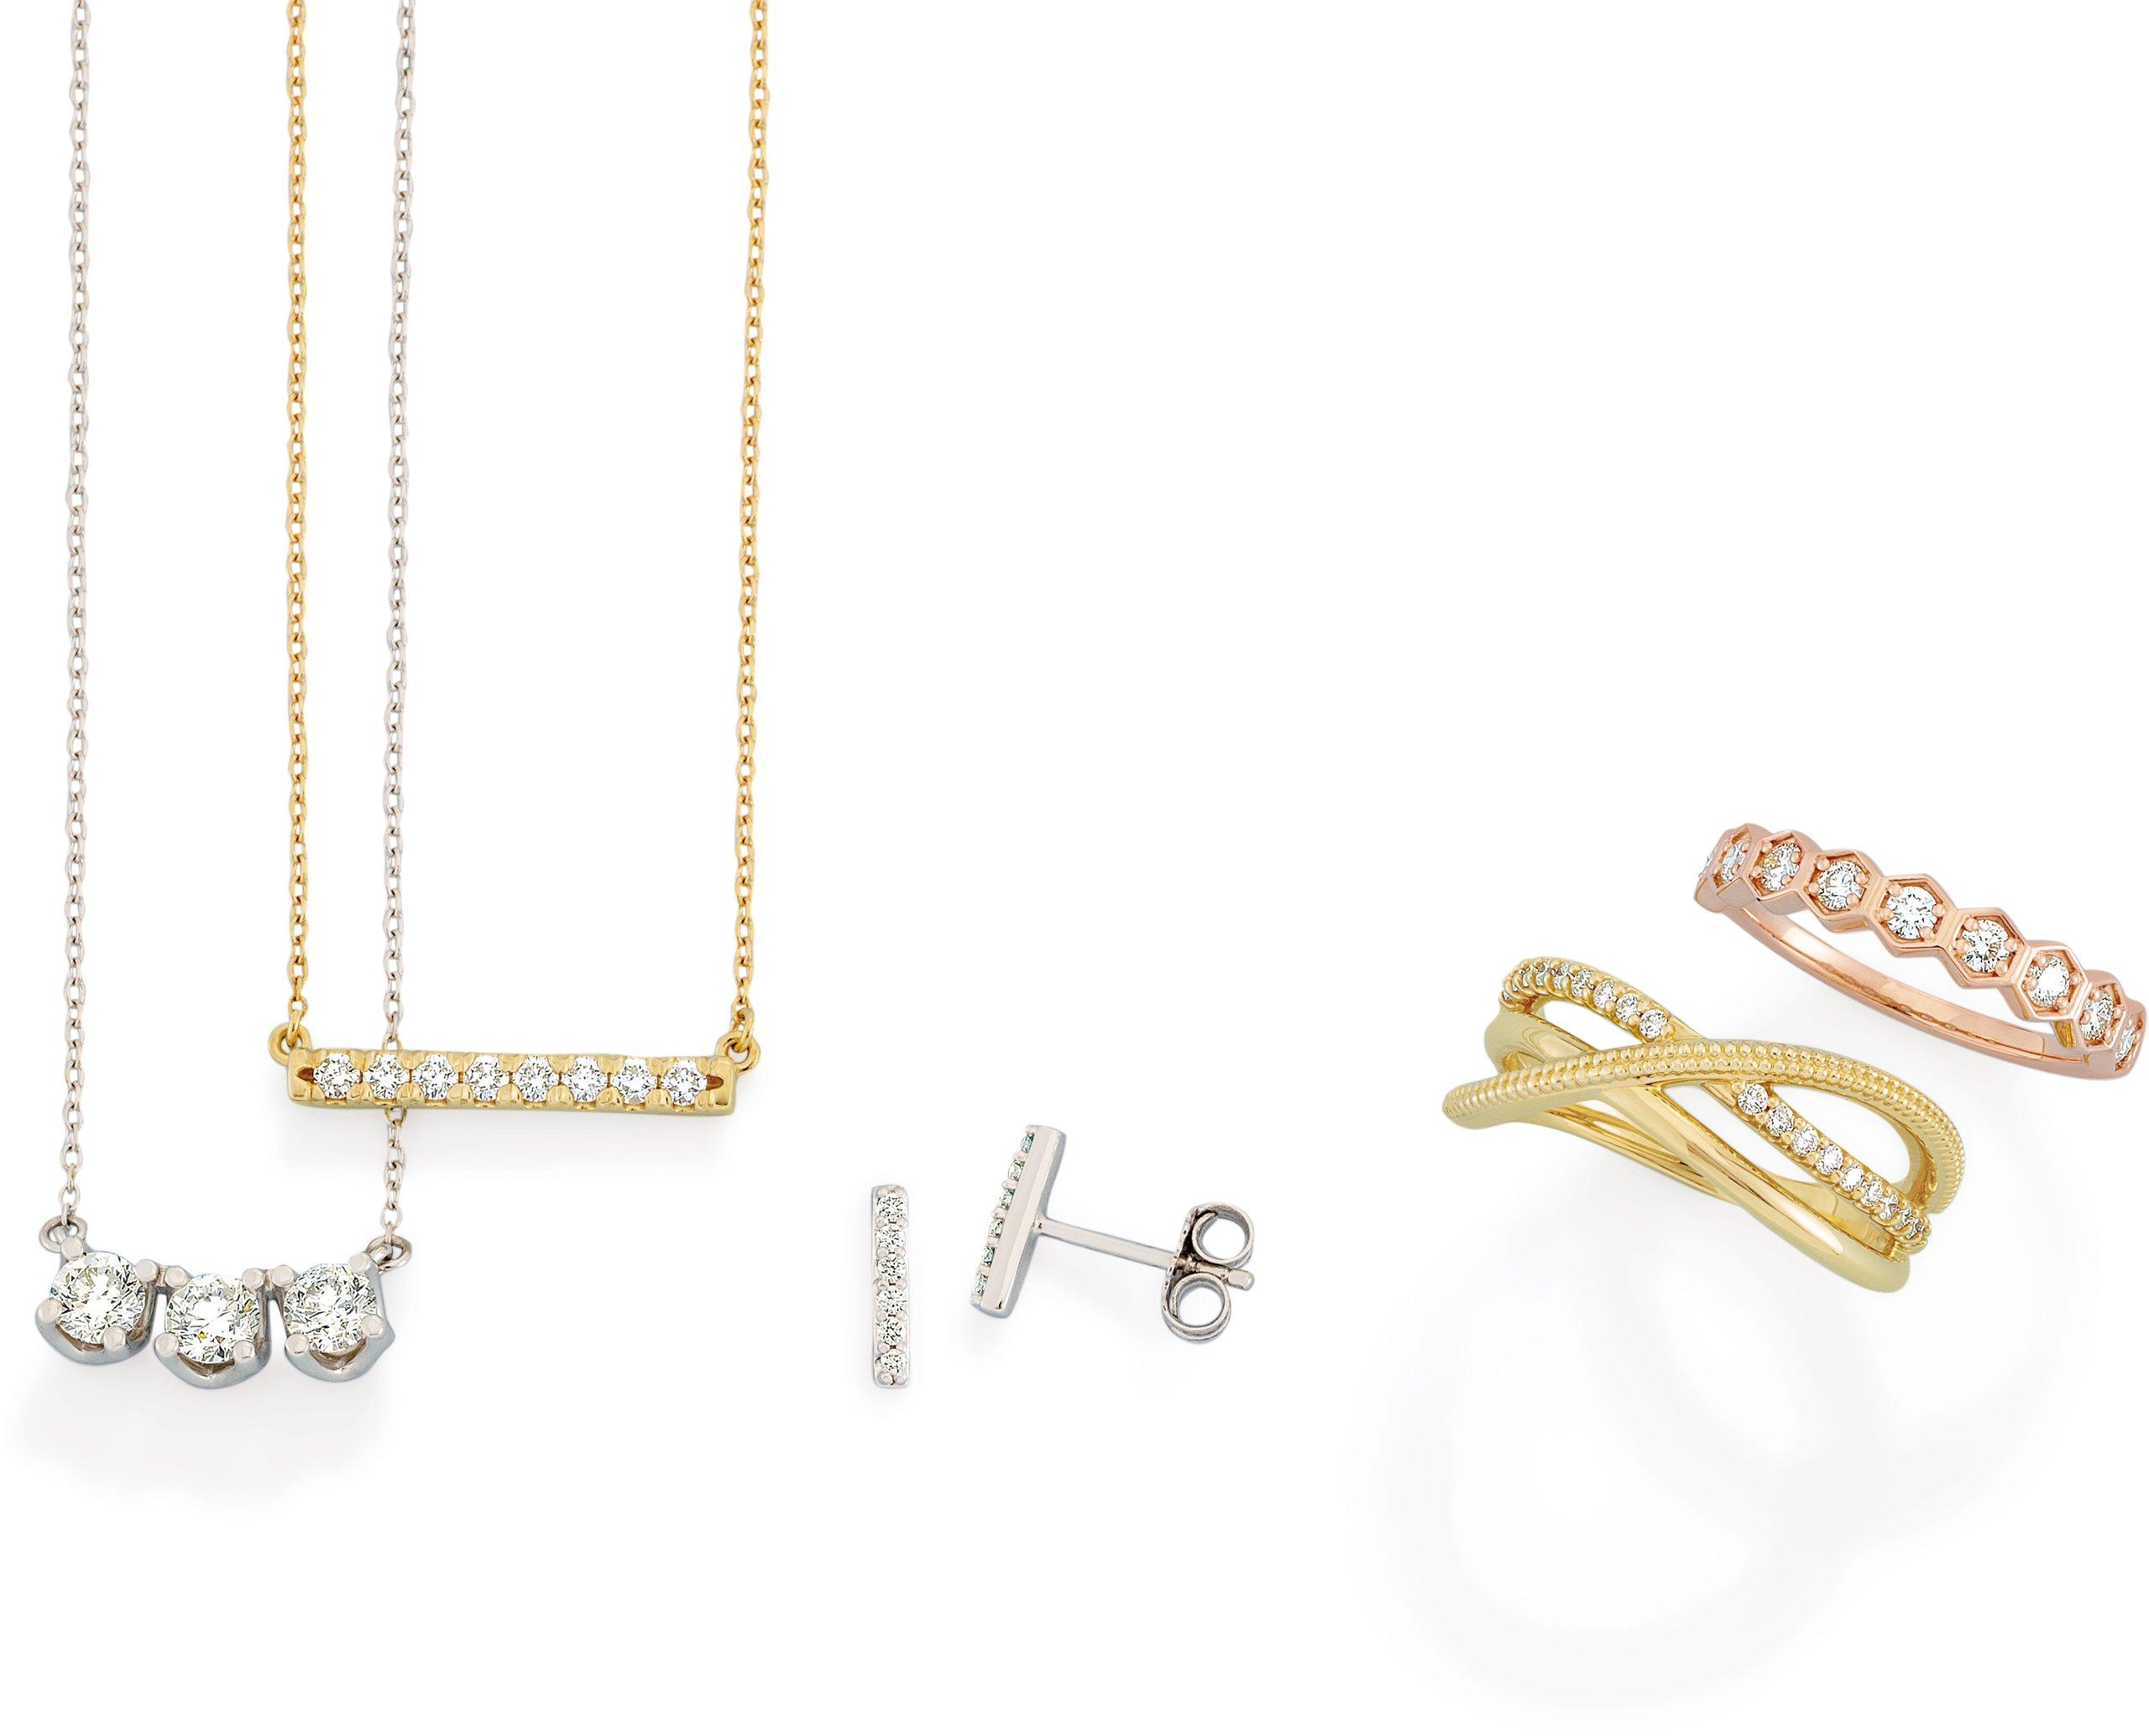 Modern Brilliance | Lab-grown diamond jewelry